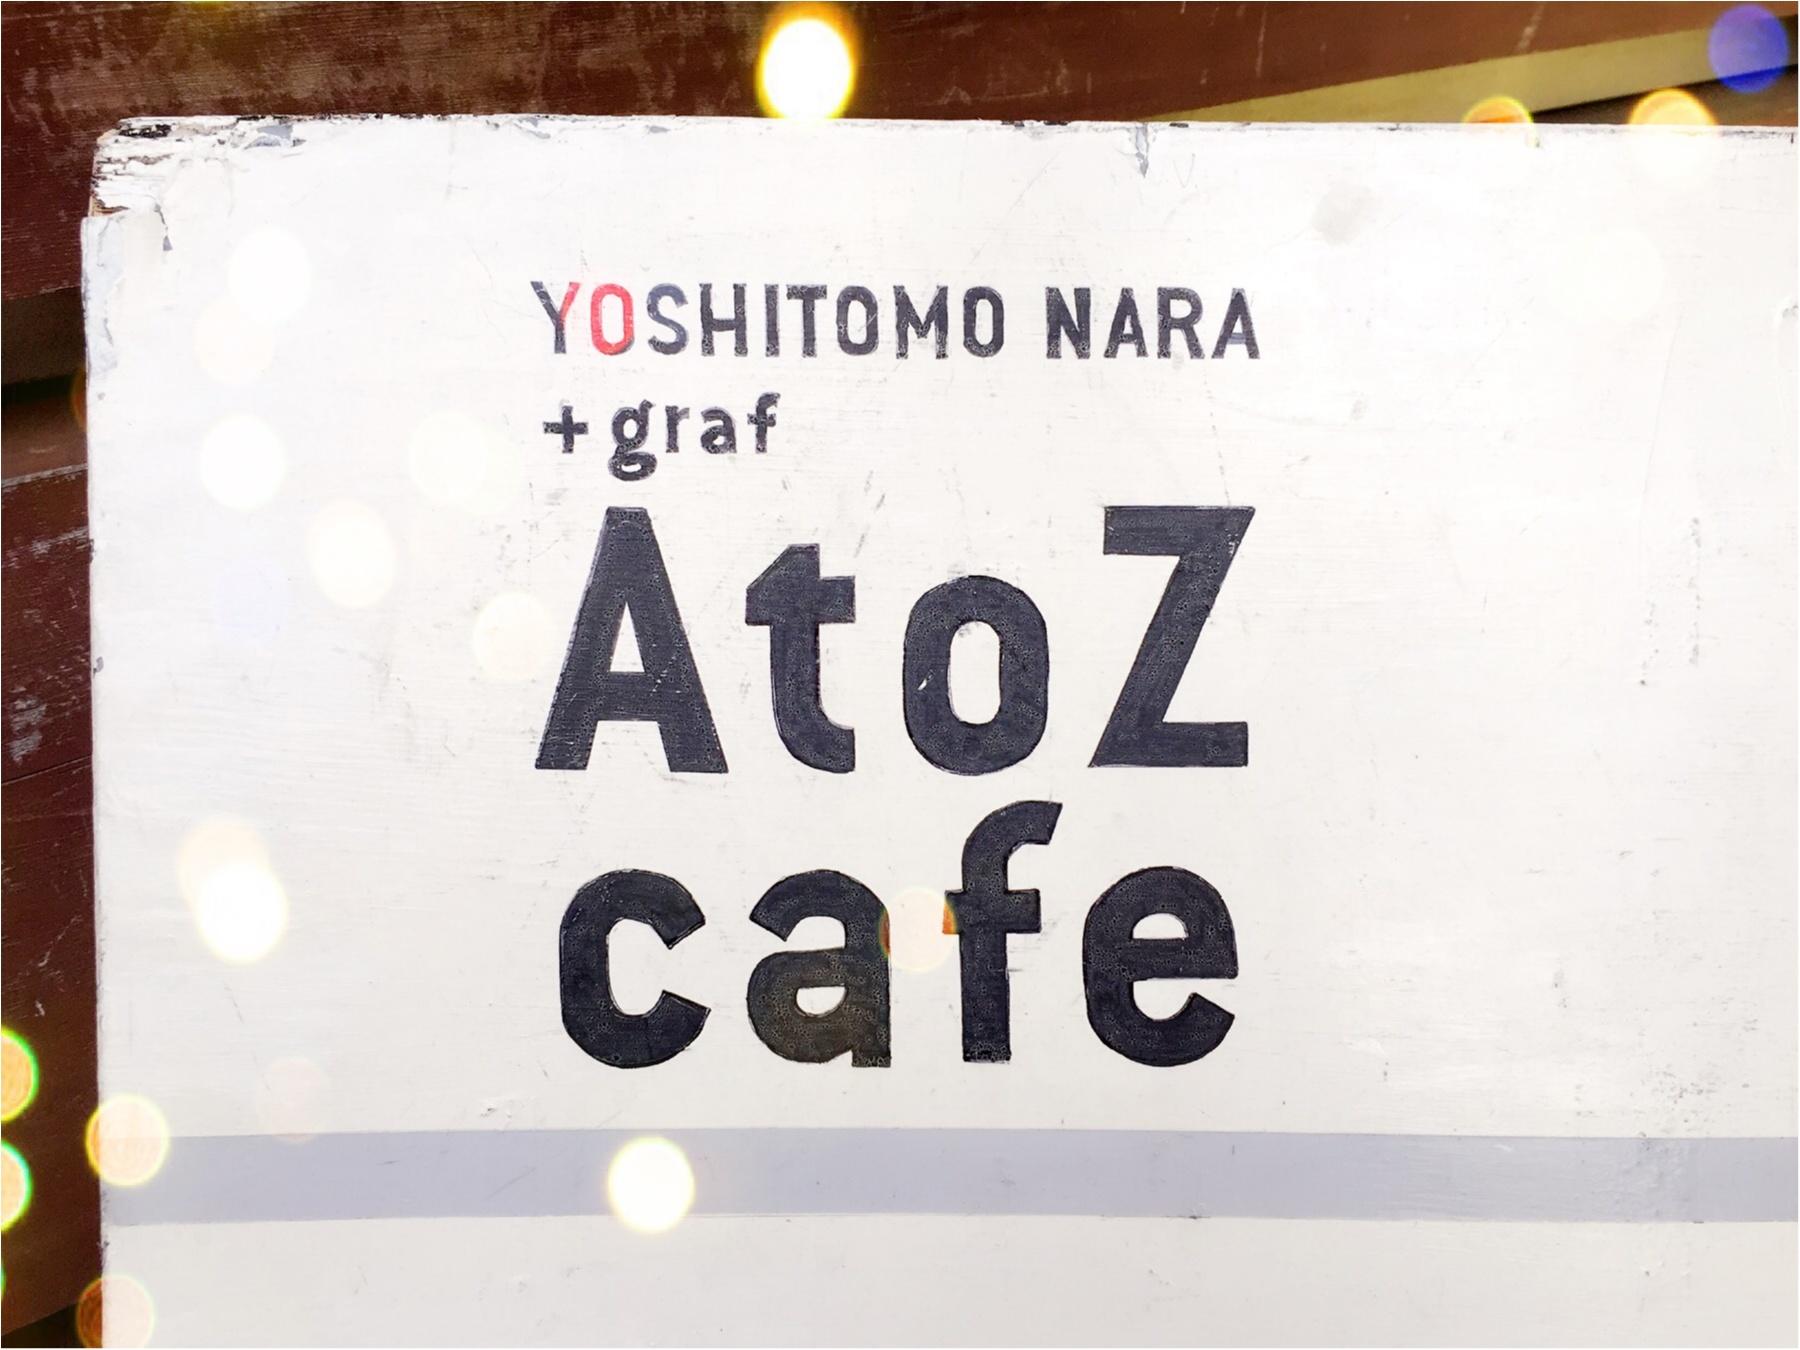 …ஐ お洒落女子会するなら!!南青山の【A to Z cafe】がオススメ♡ ஐ¨_1